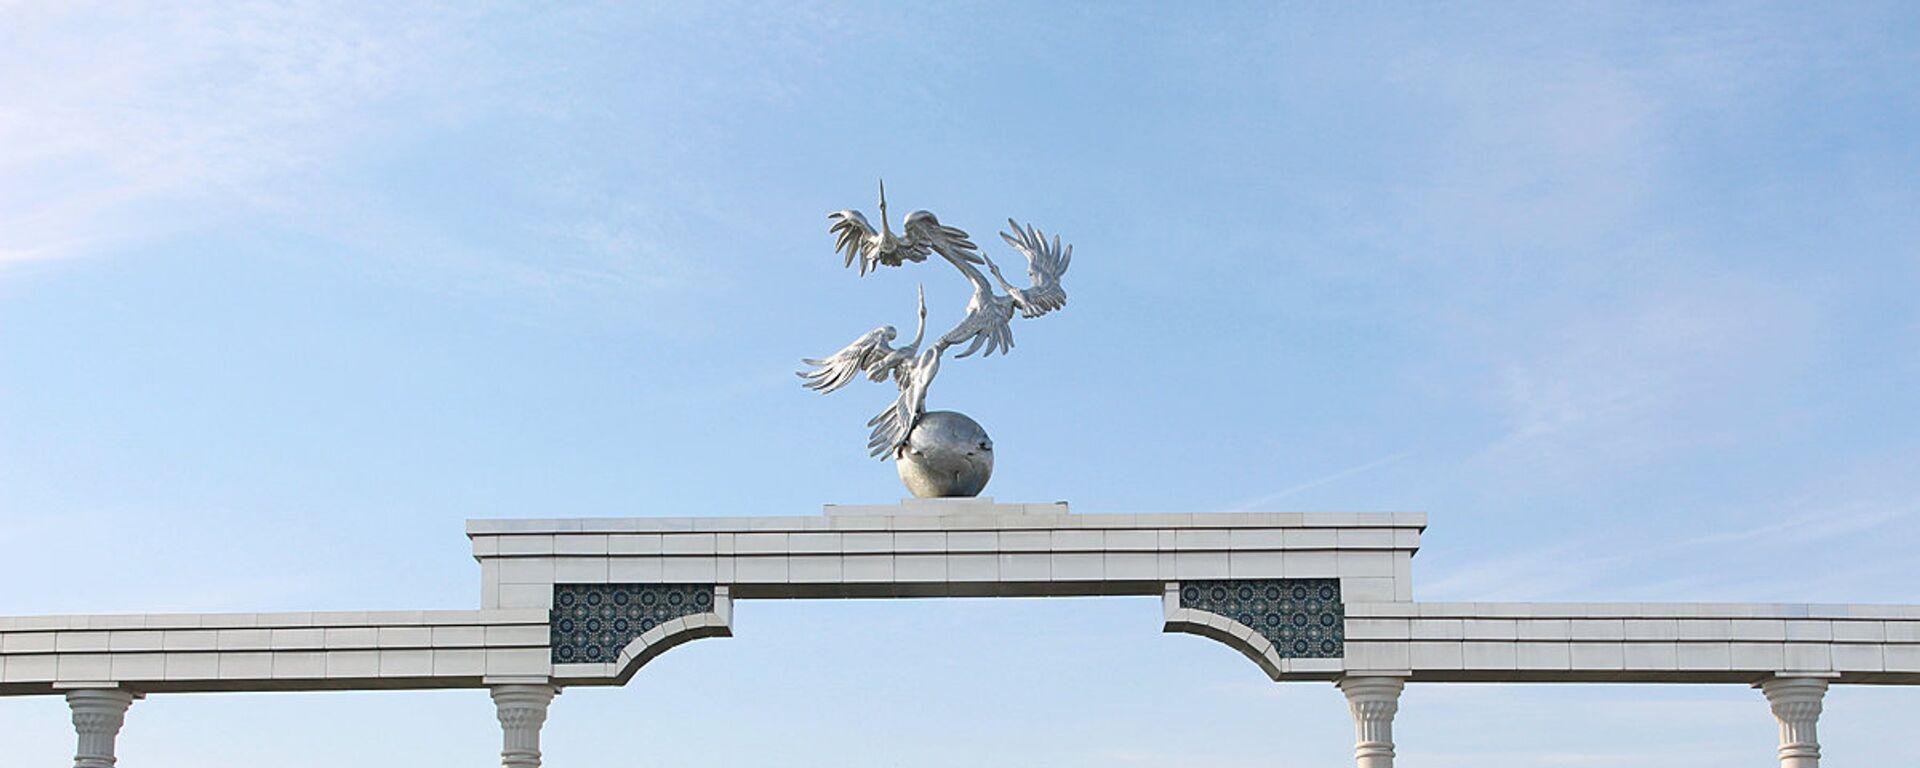 Площадь Независимости - Sputnik Узбекистан, 1920, 30.08.2021